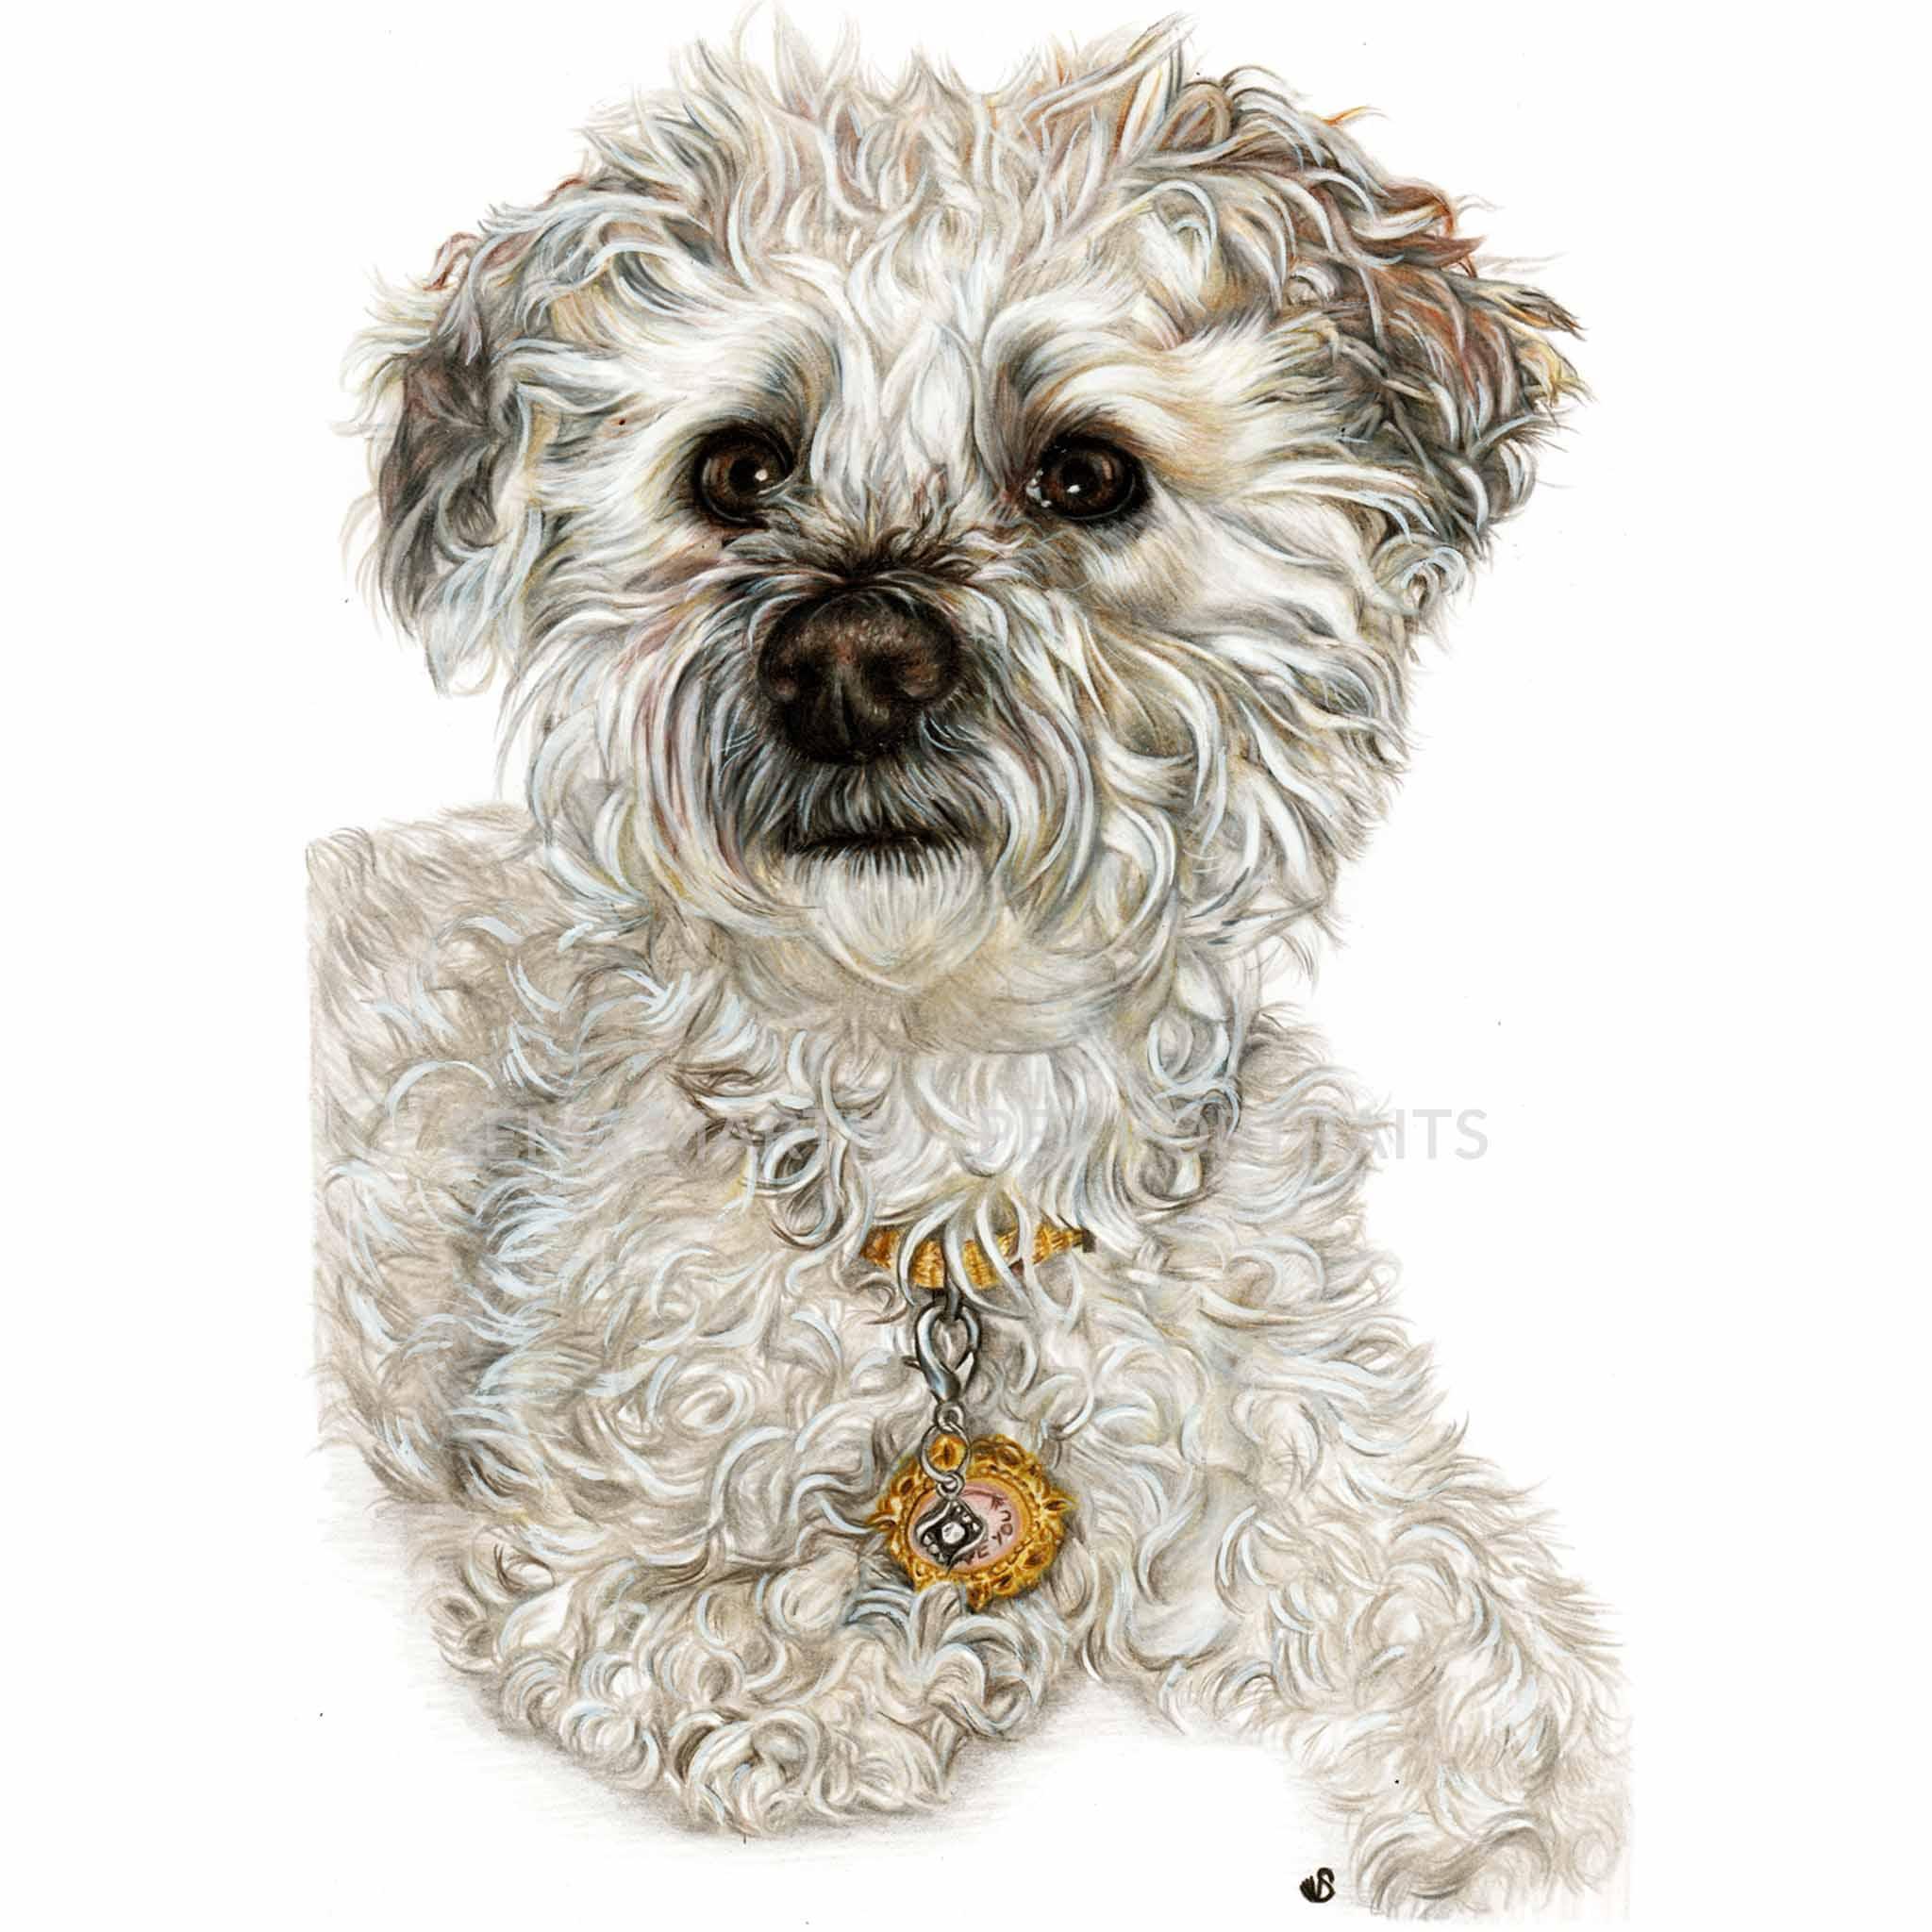 color pencil pet portrait of dog Yorkiepoo by artist sema martin